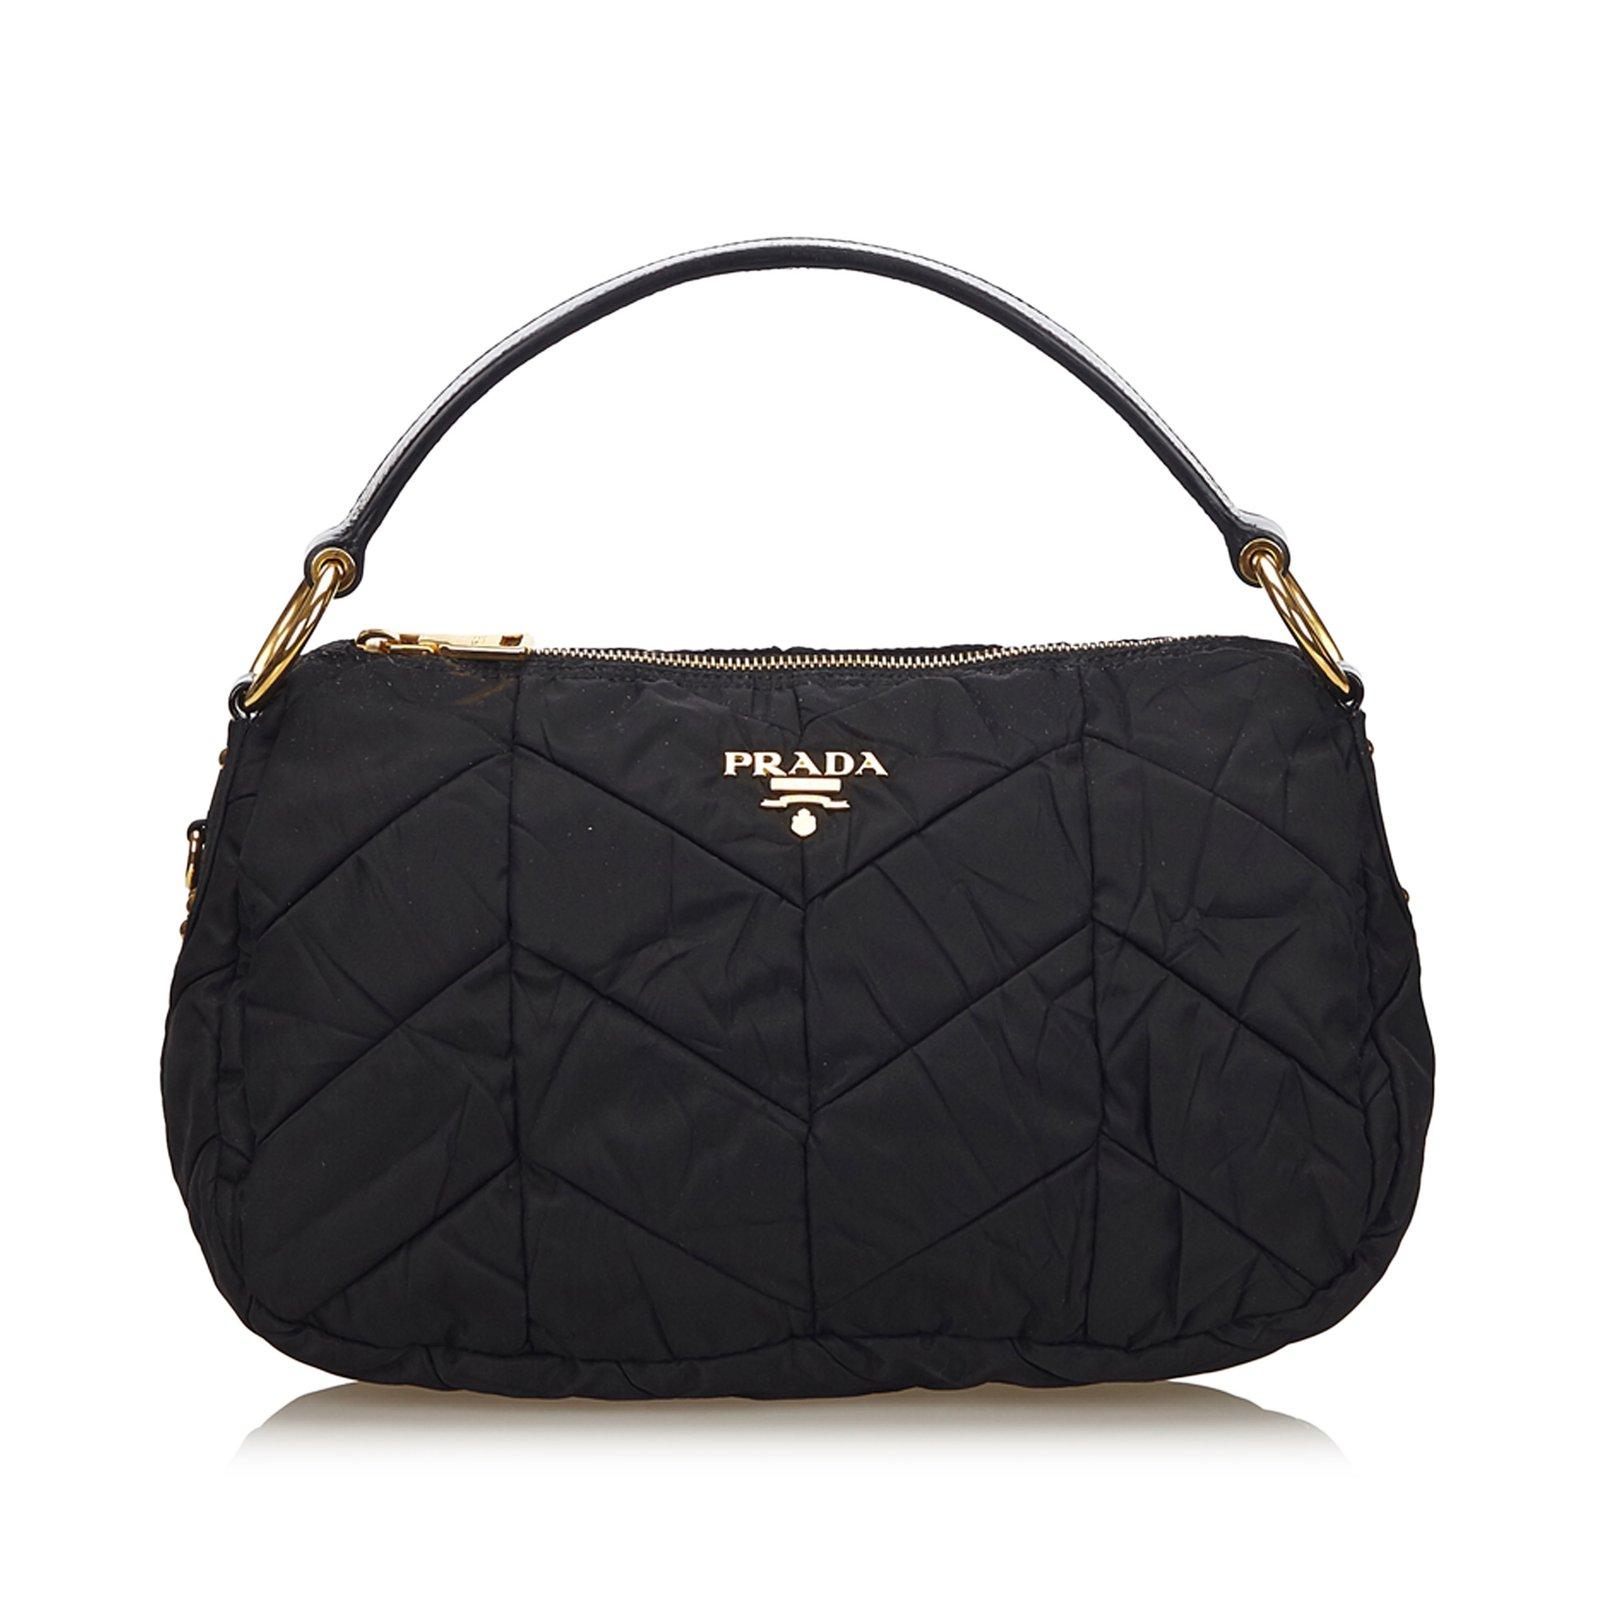 bf9e019bdbc0 ... uk prada nylon tessuto handbag handbags leatherpatent leathernyloncloth  black ref. 71137 d1c4a